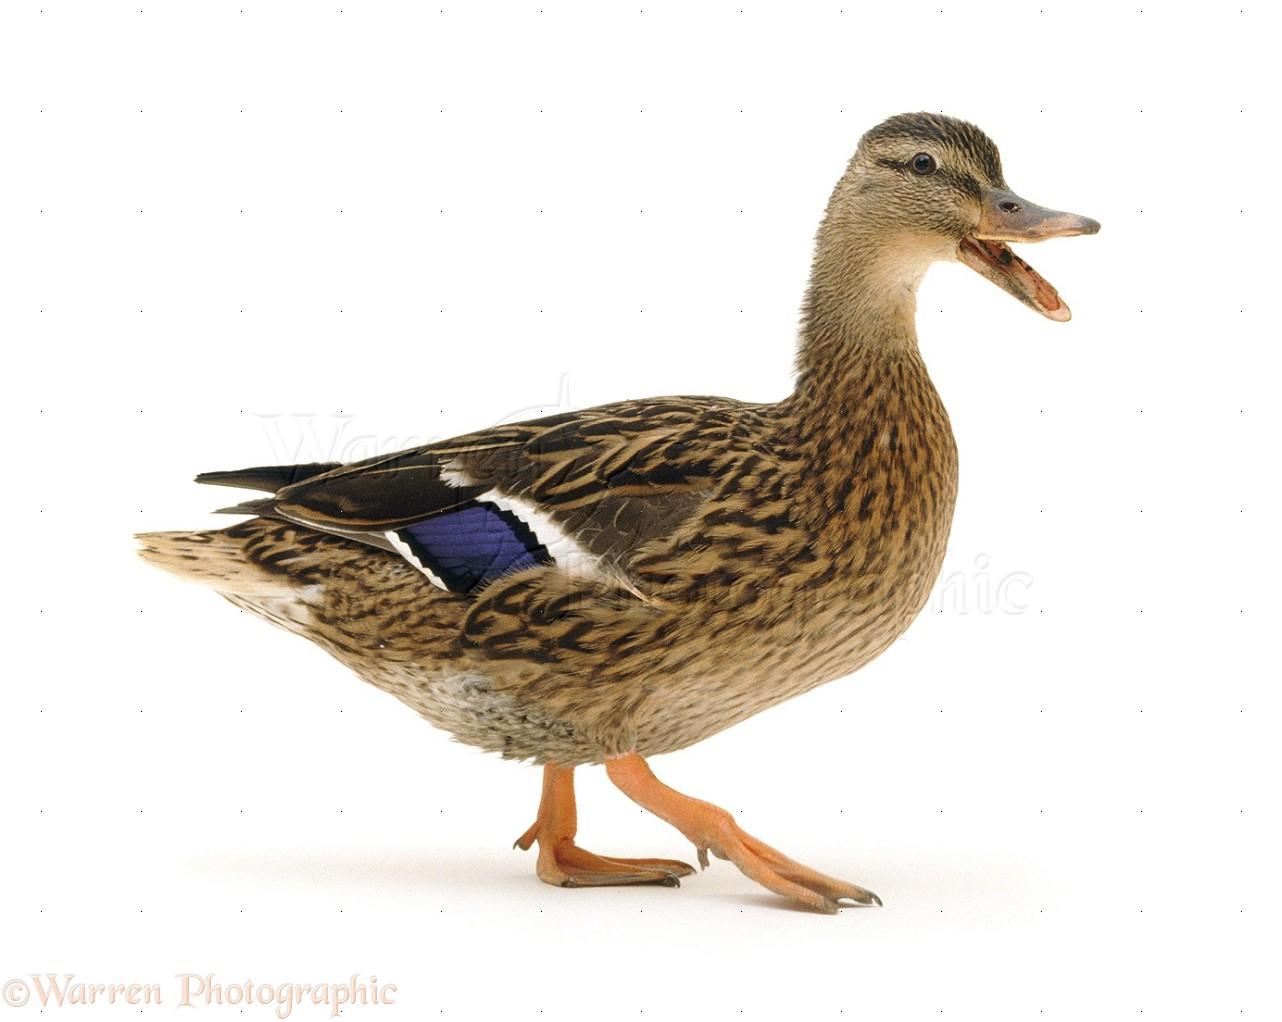 09596-Mallard-duck-quacking-white-background.jpg